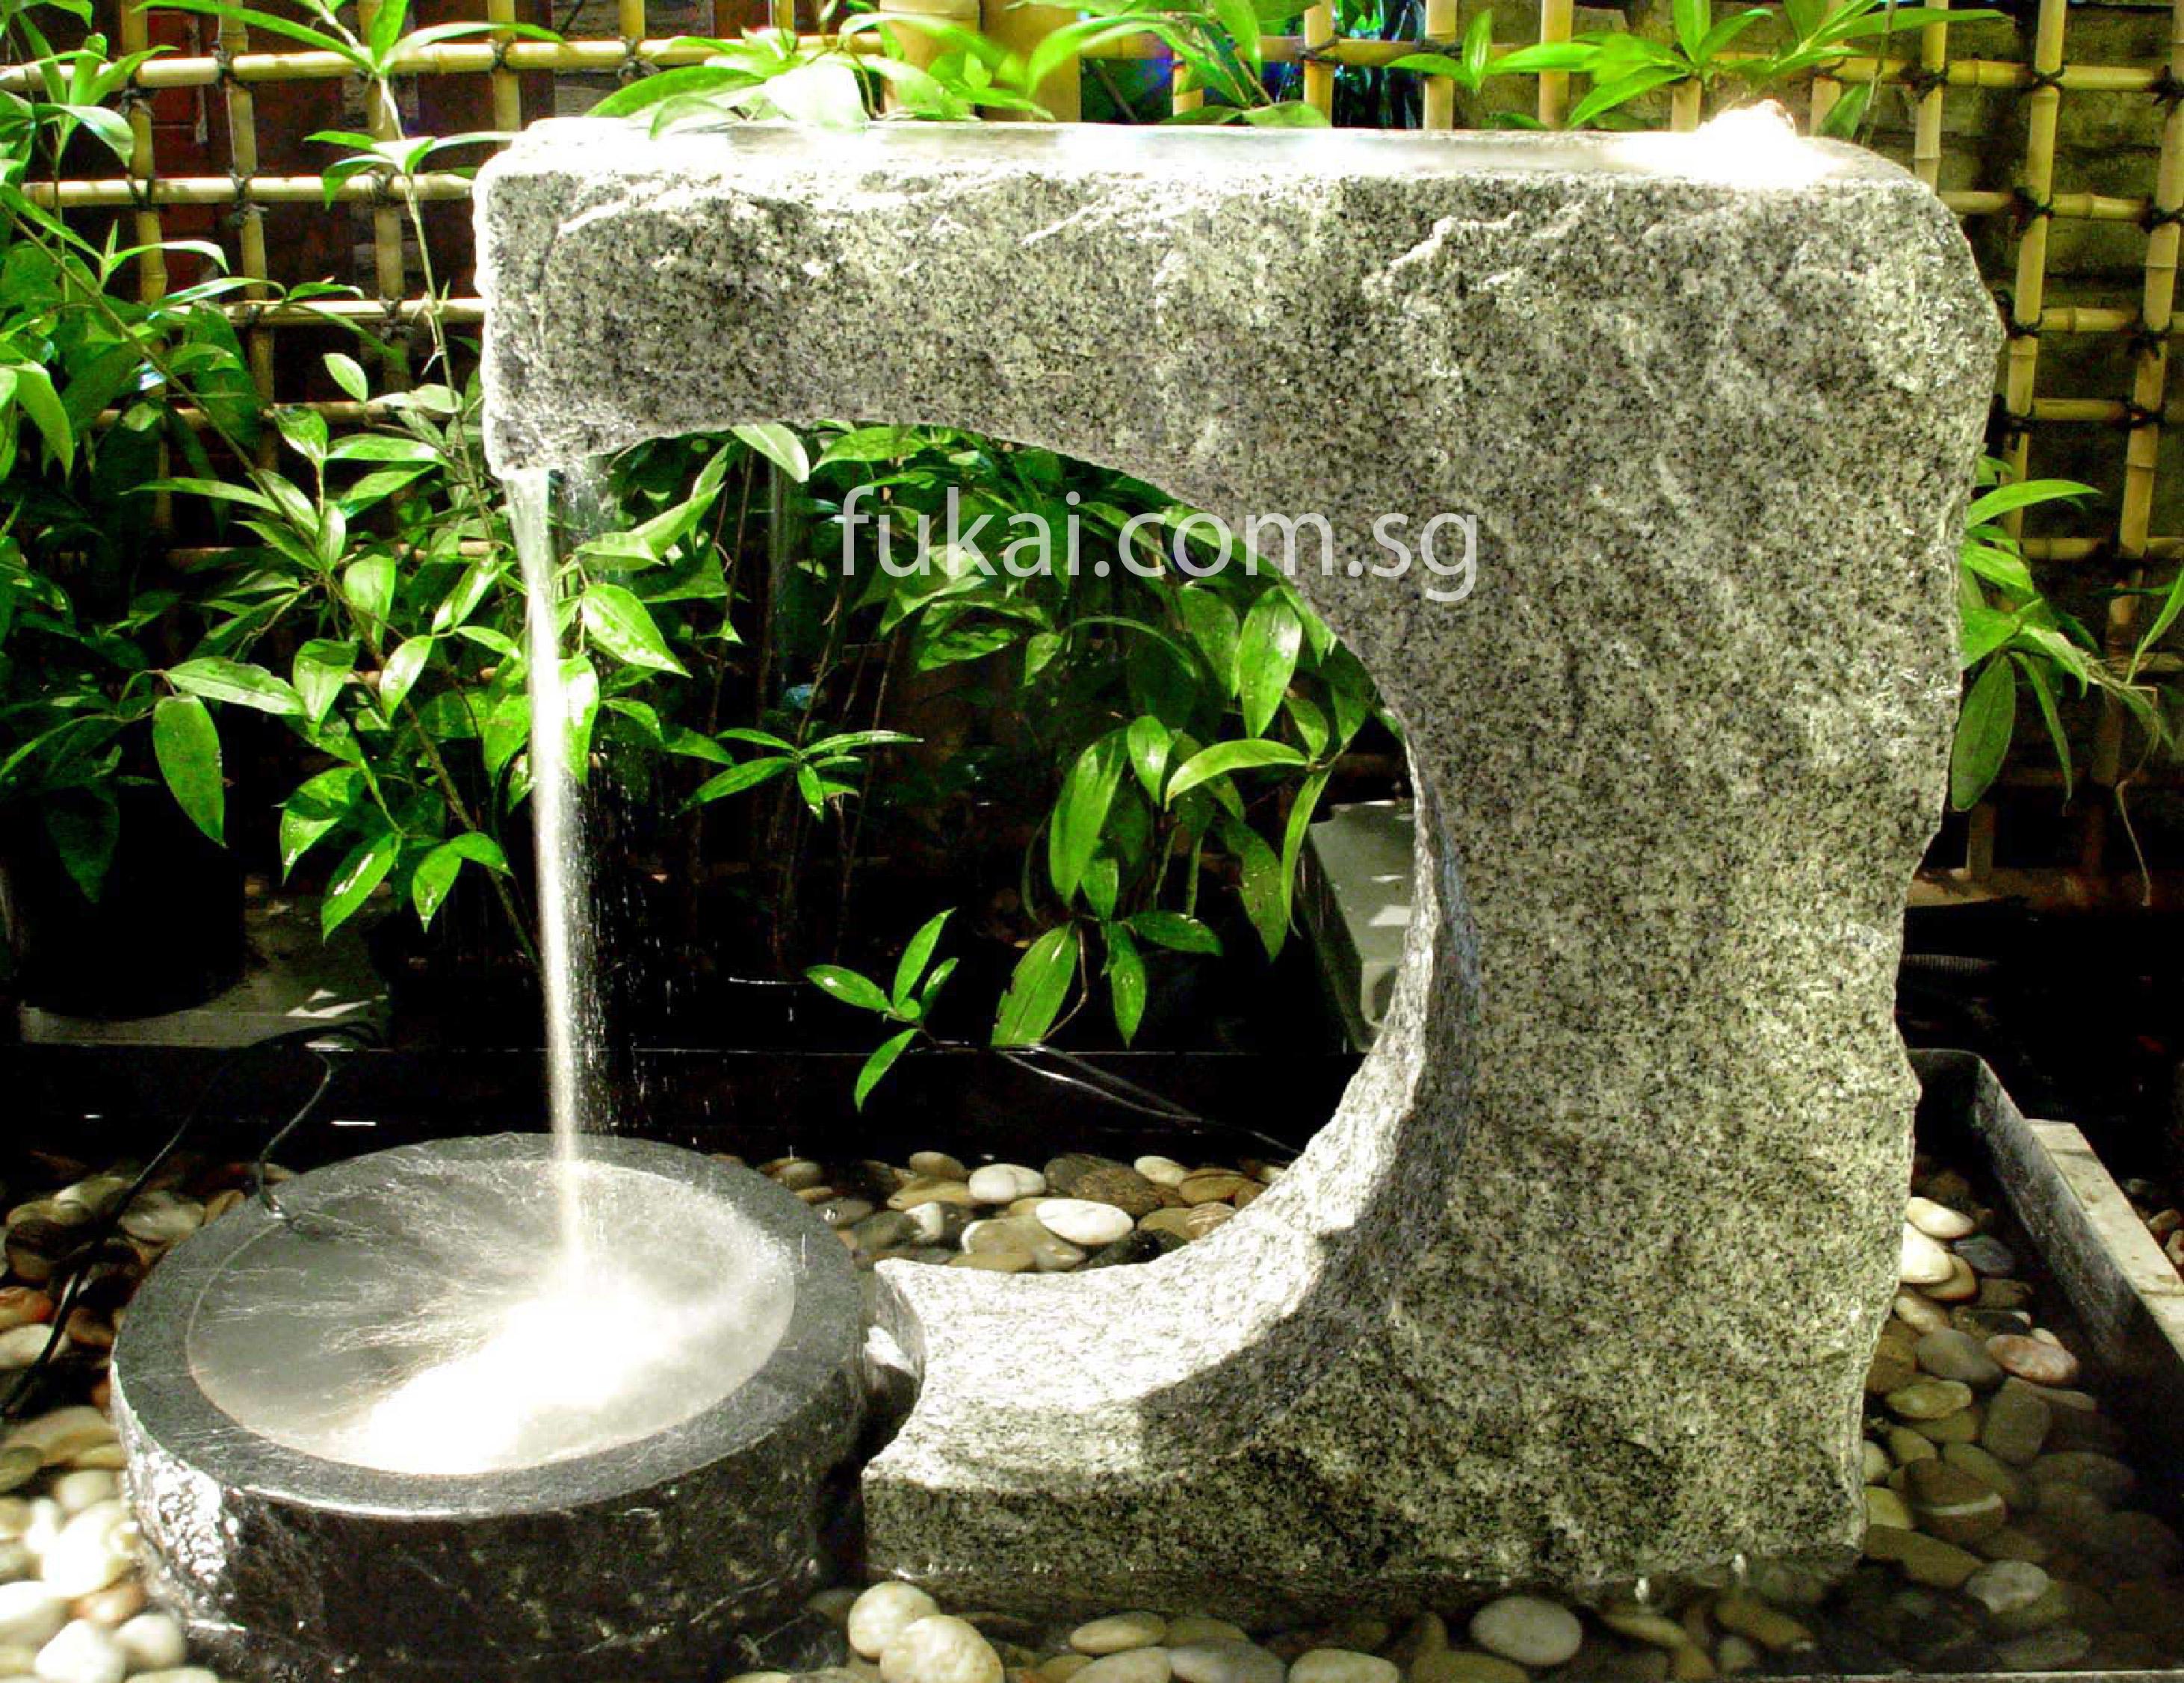 Water-feature-fountain-fukai-Singapore